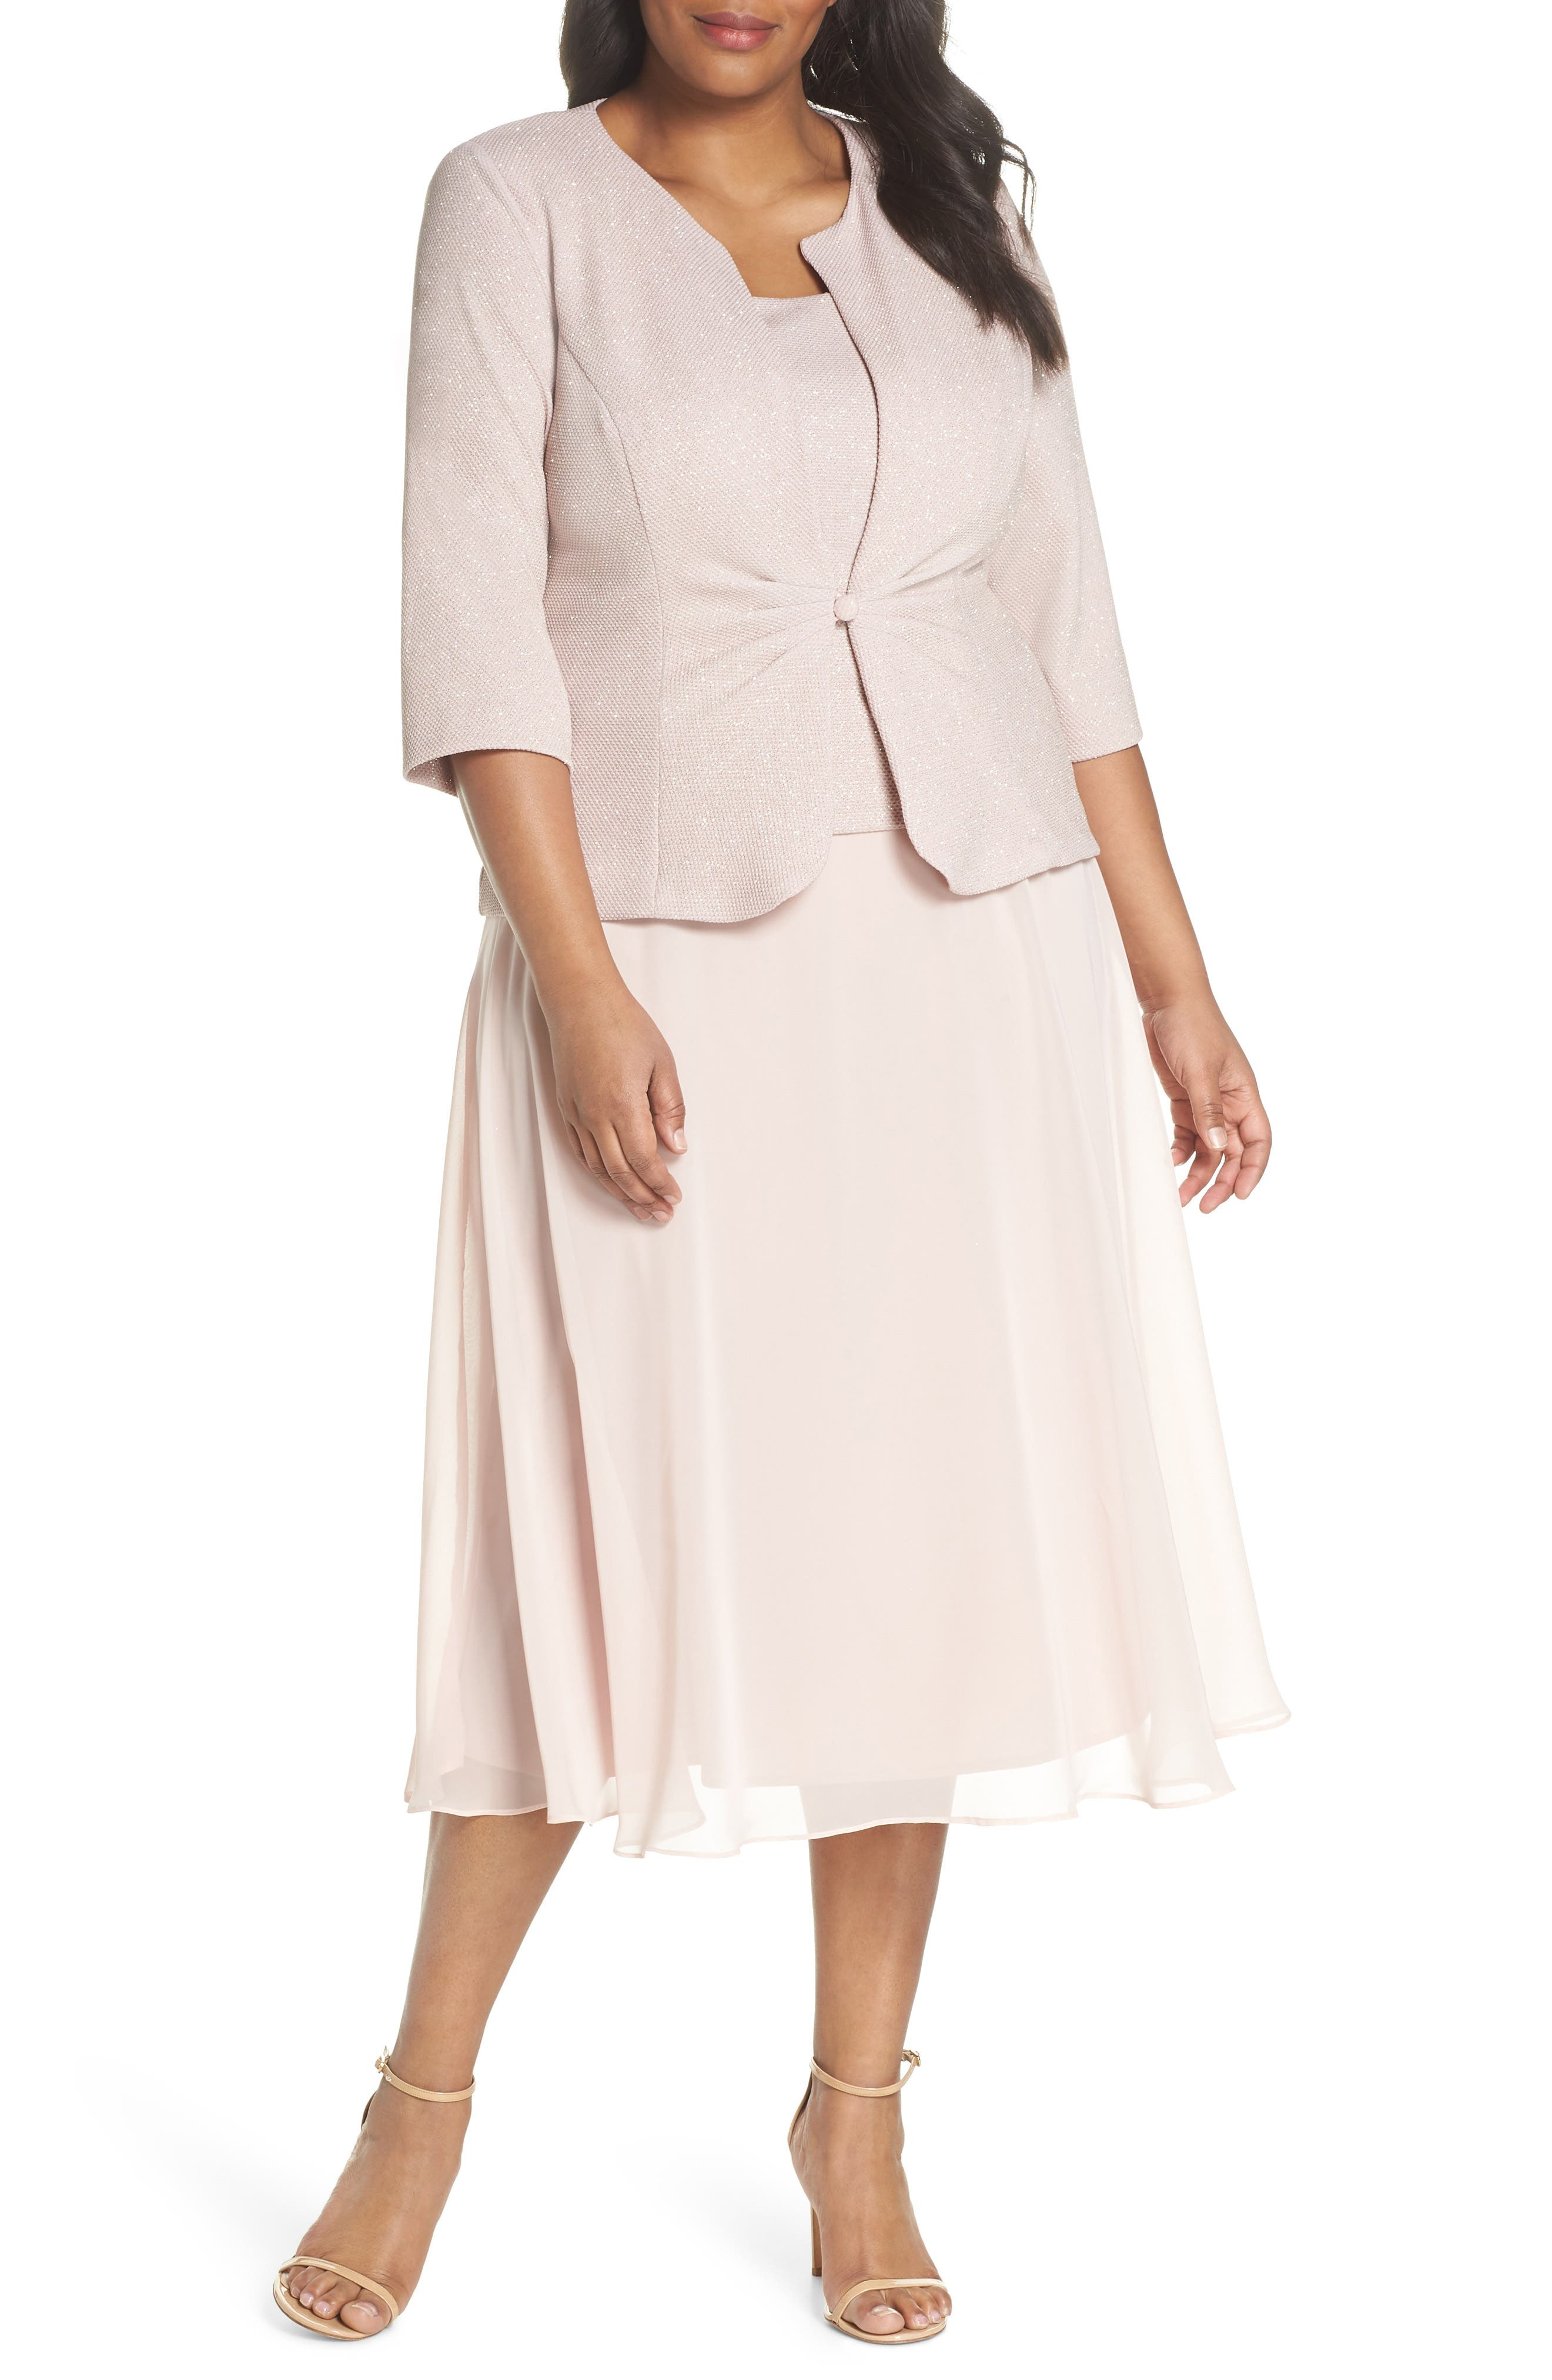 Main Image - Alex Evenings Glitter Tea Length A-Line Dress with Jacket (Plus Size)